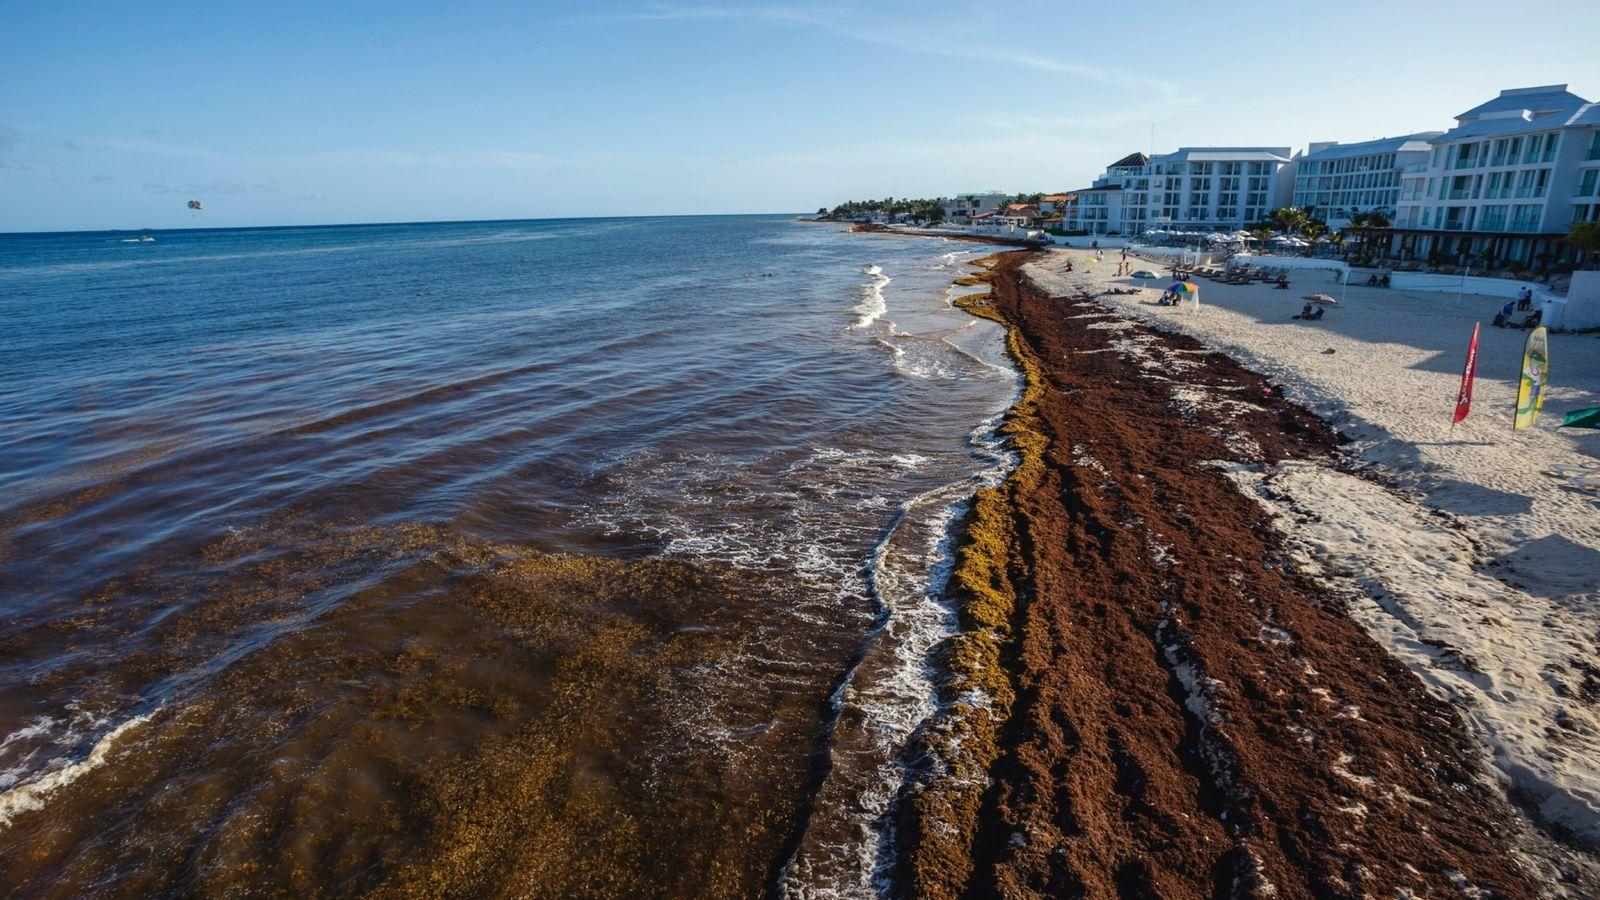 Sargaço contamina as praias do Caribe mexicano